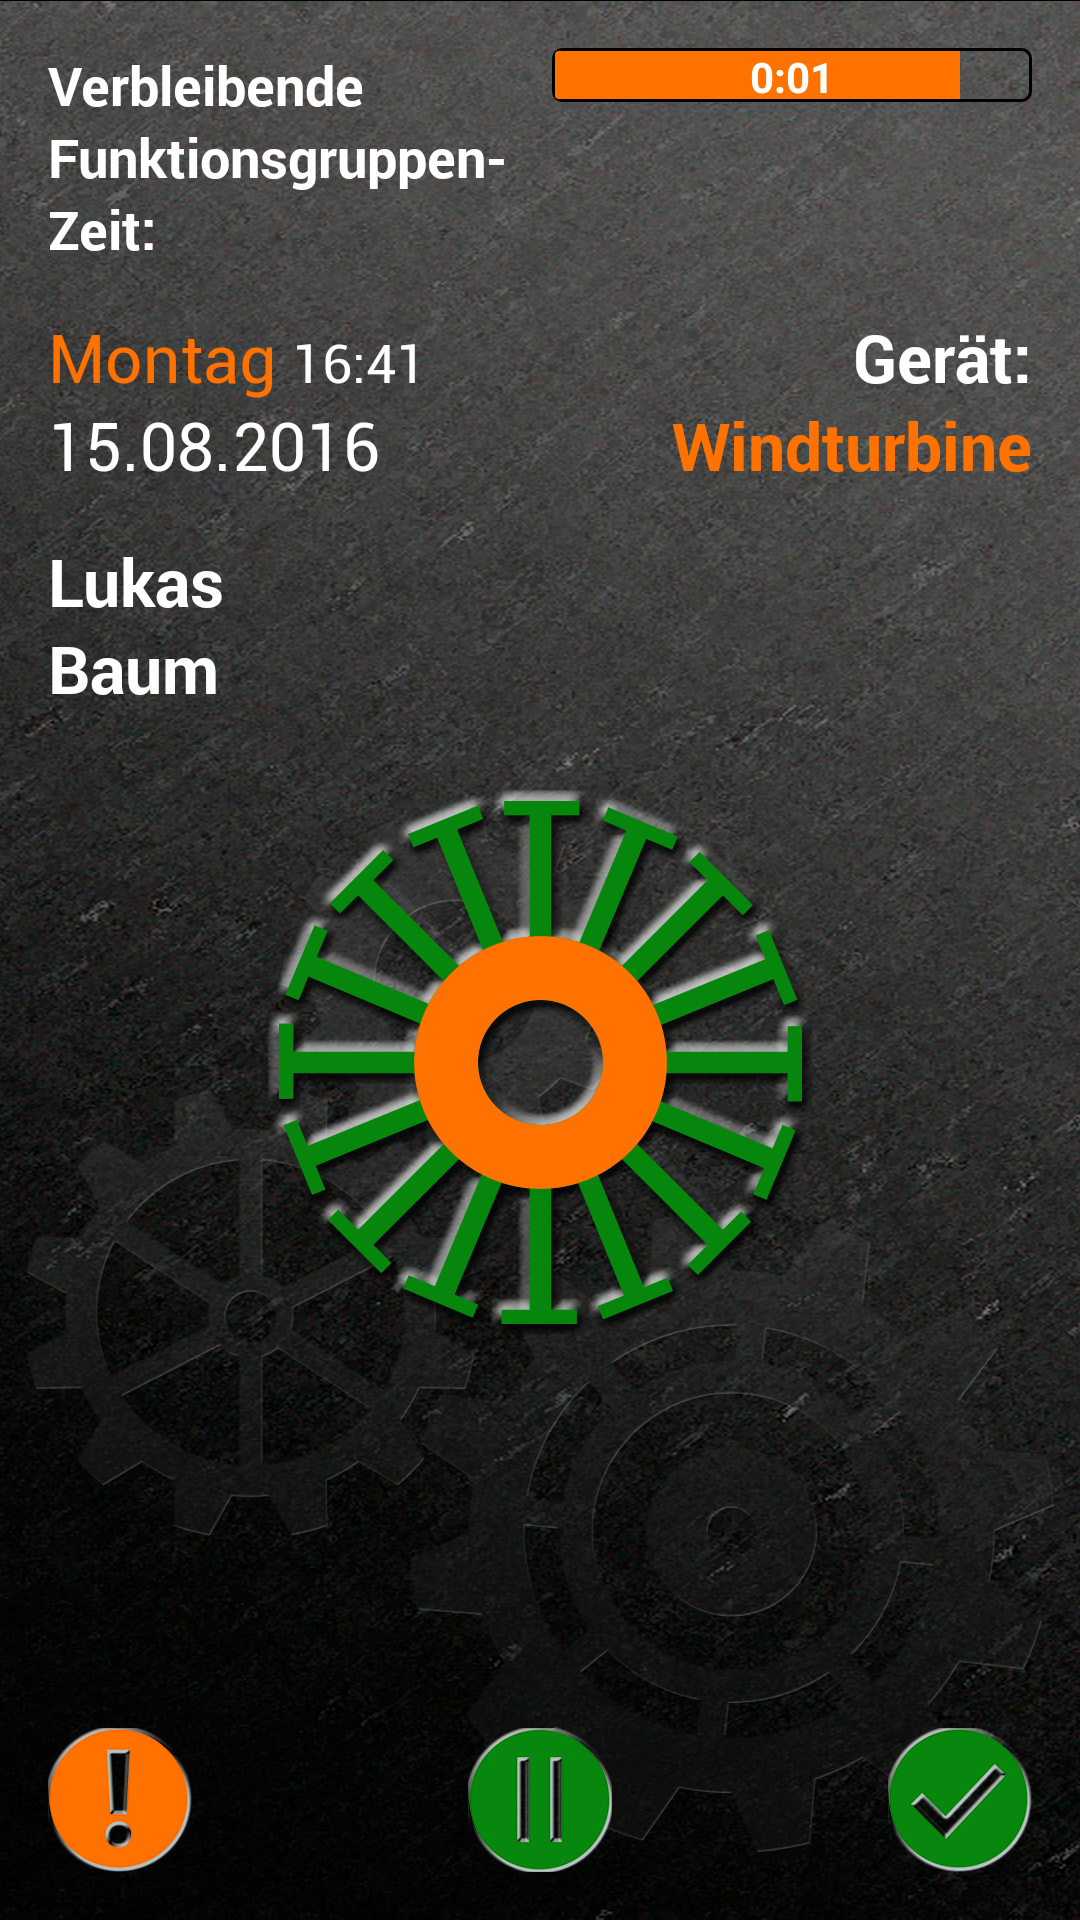 ginstr_app_industrialMaintenanceManagerPlus_DE_5